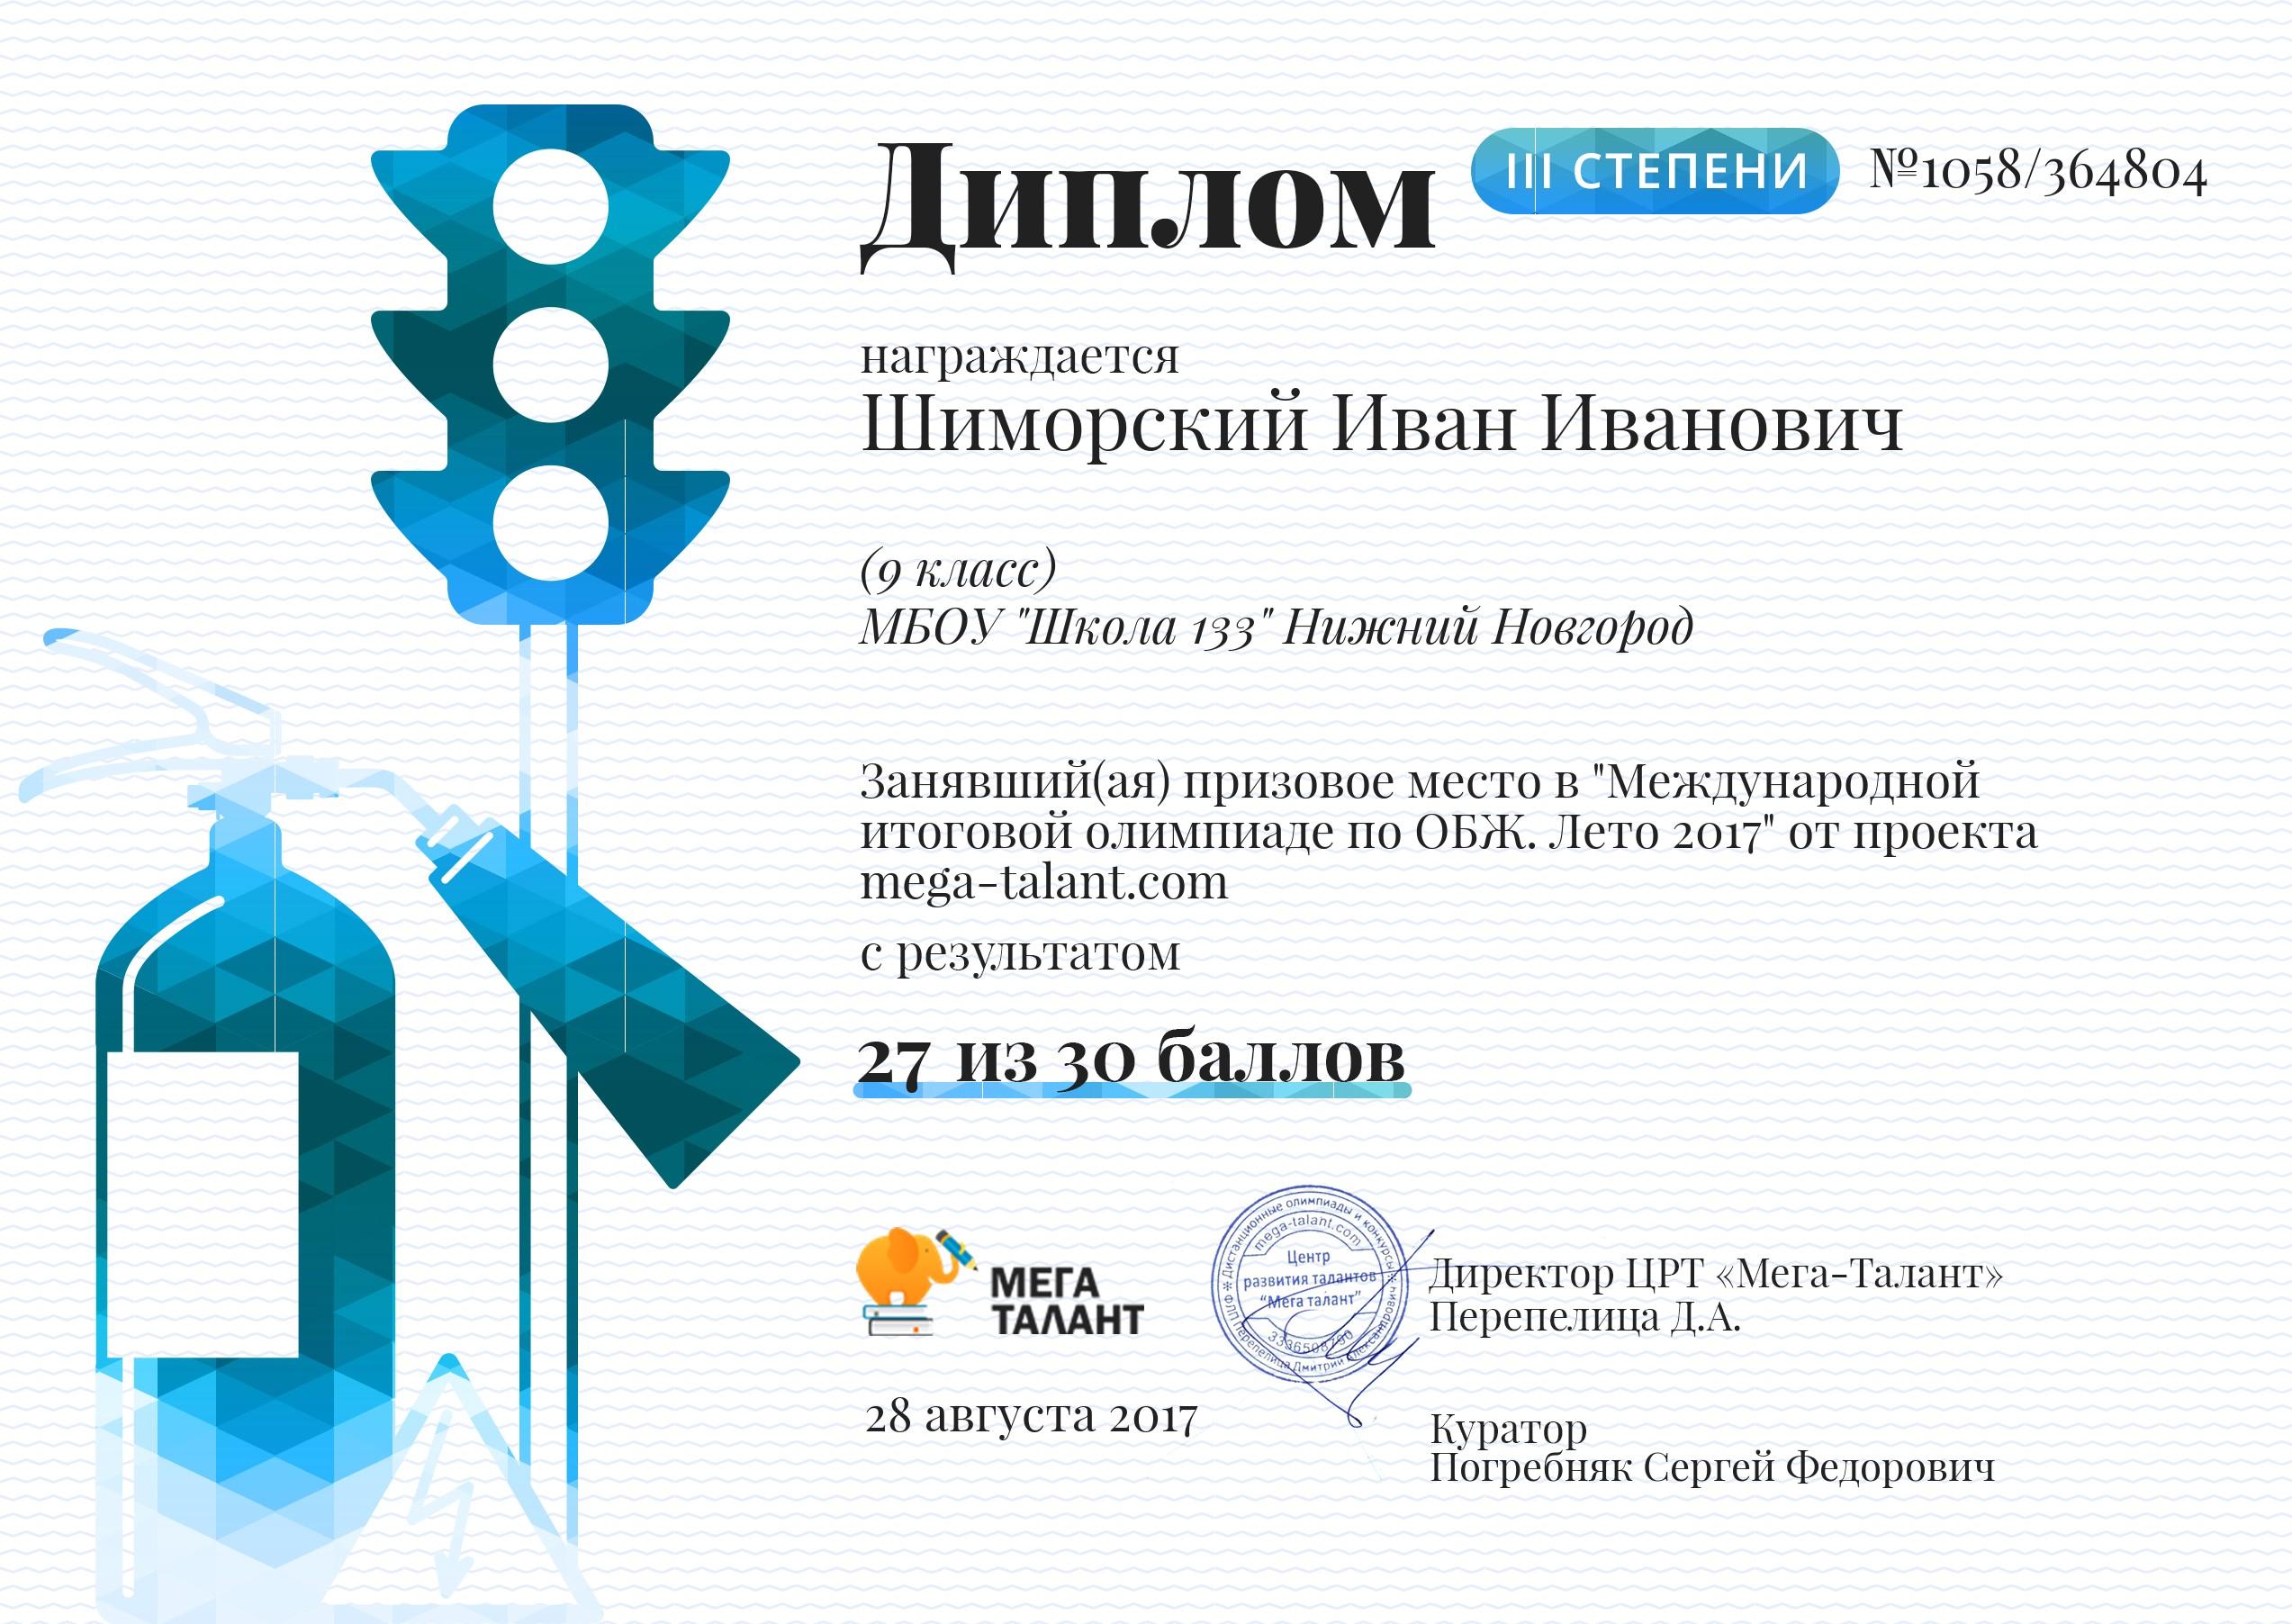 364804_shimorskiy-ivan-ivanovich.jpg